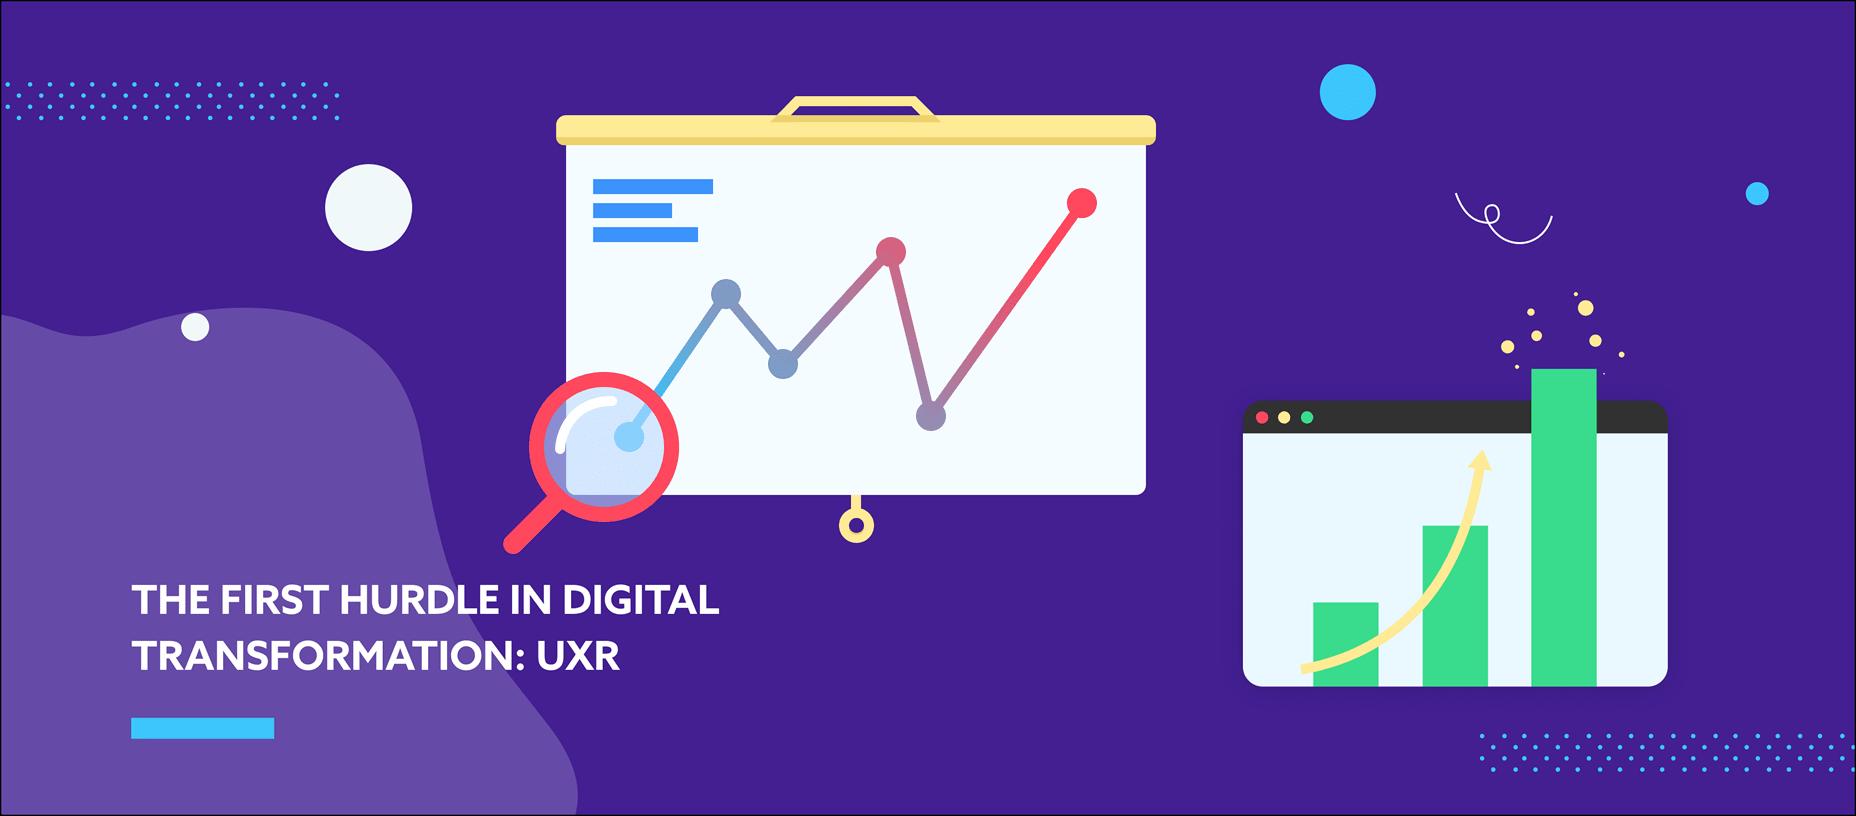 The First Hurdle in Digital Transformation: UXR